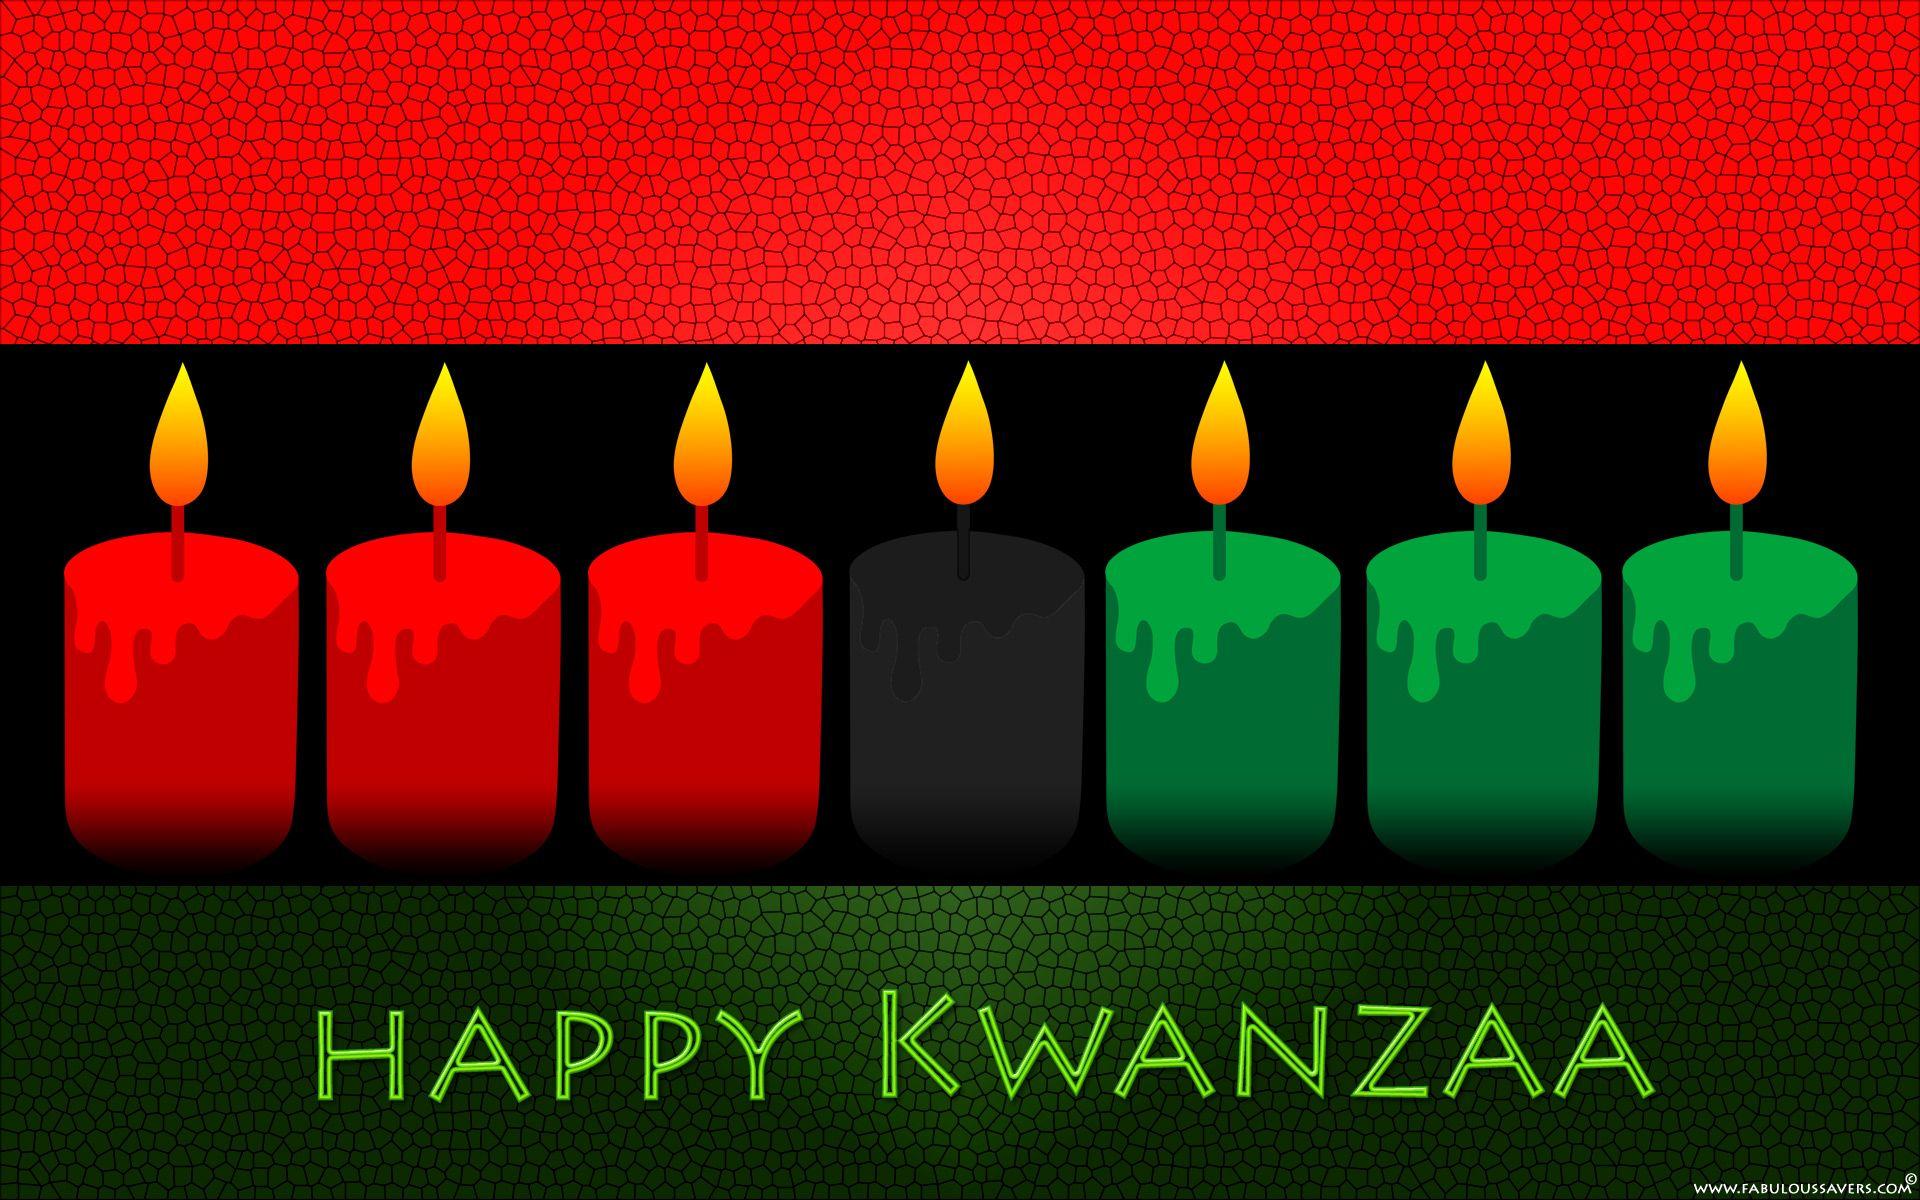 Happy Kwanzaa Day computer desktop wallpaper Kwanzaa in 1920x1200